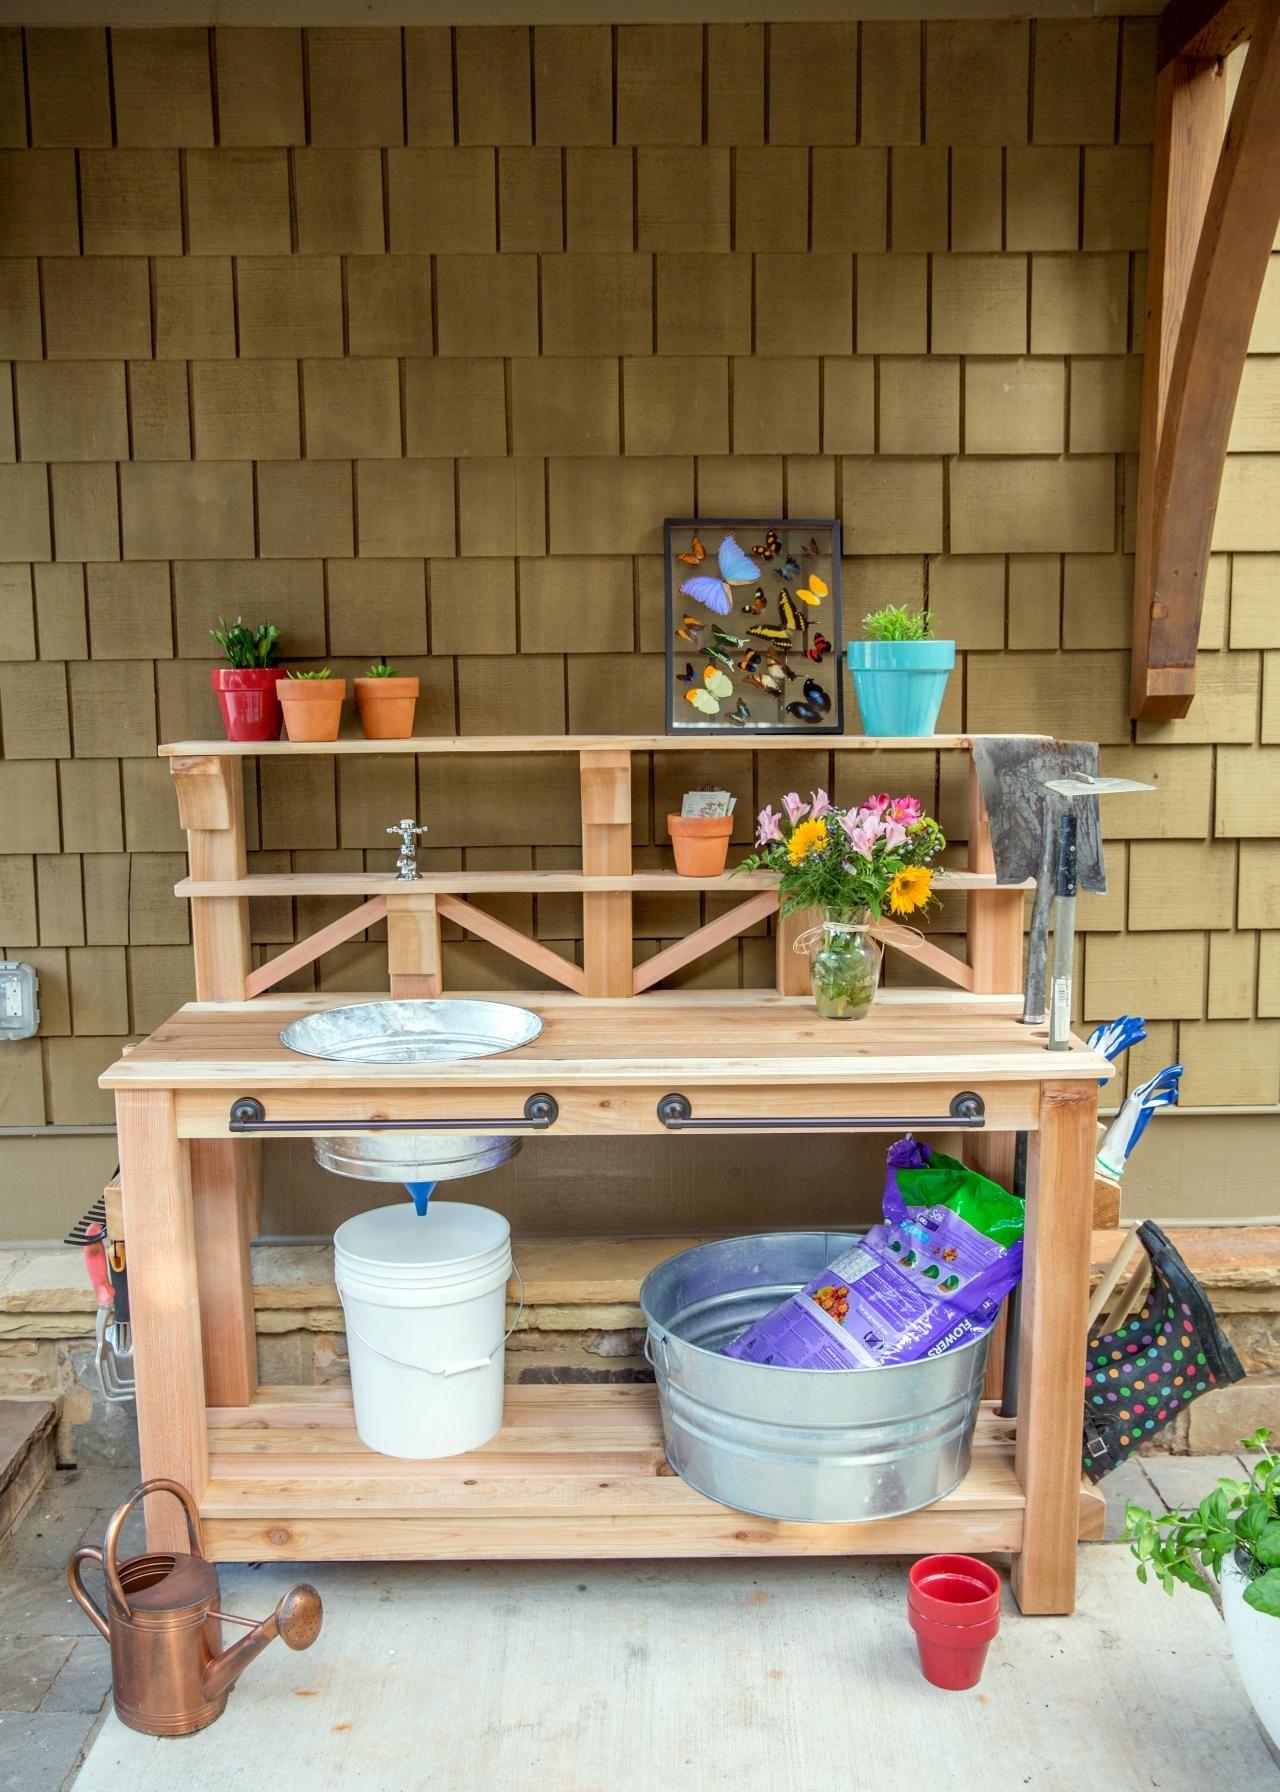 How to Make a Gardener's Potting Bench Diy toy storage